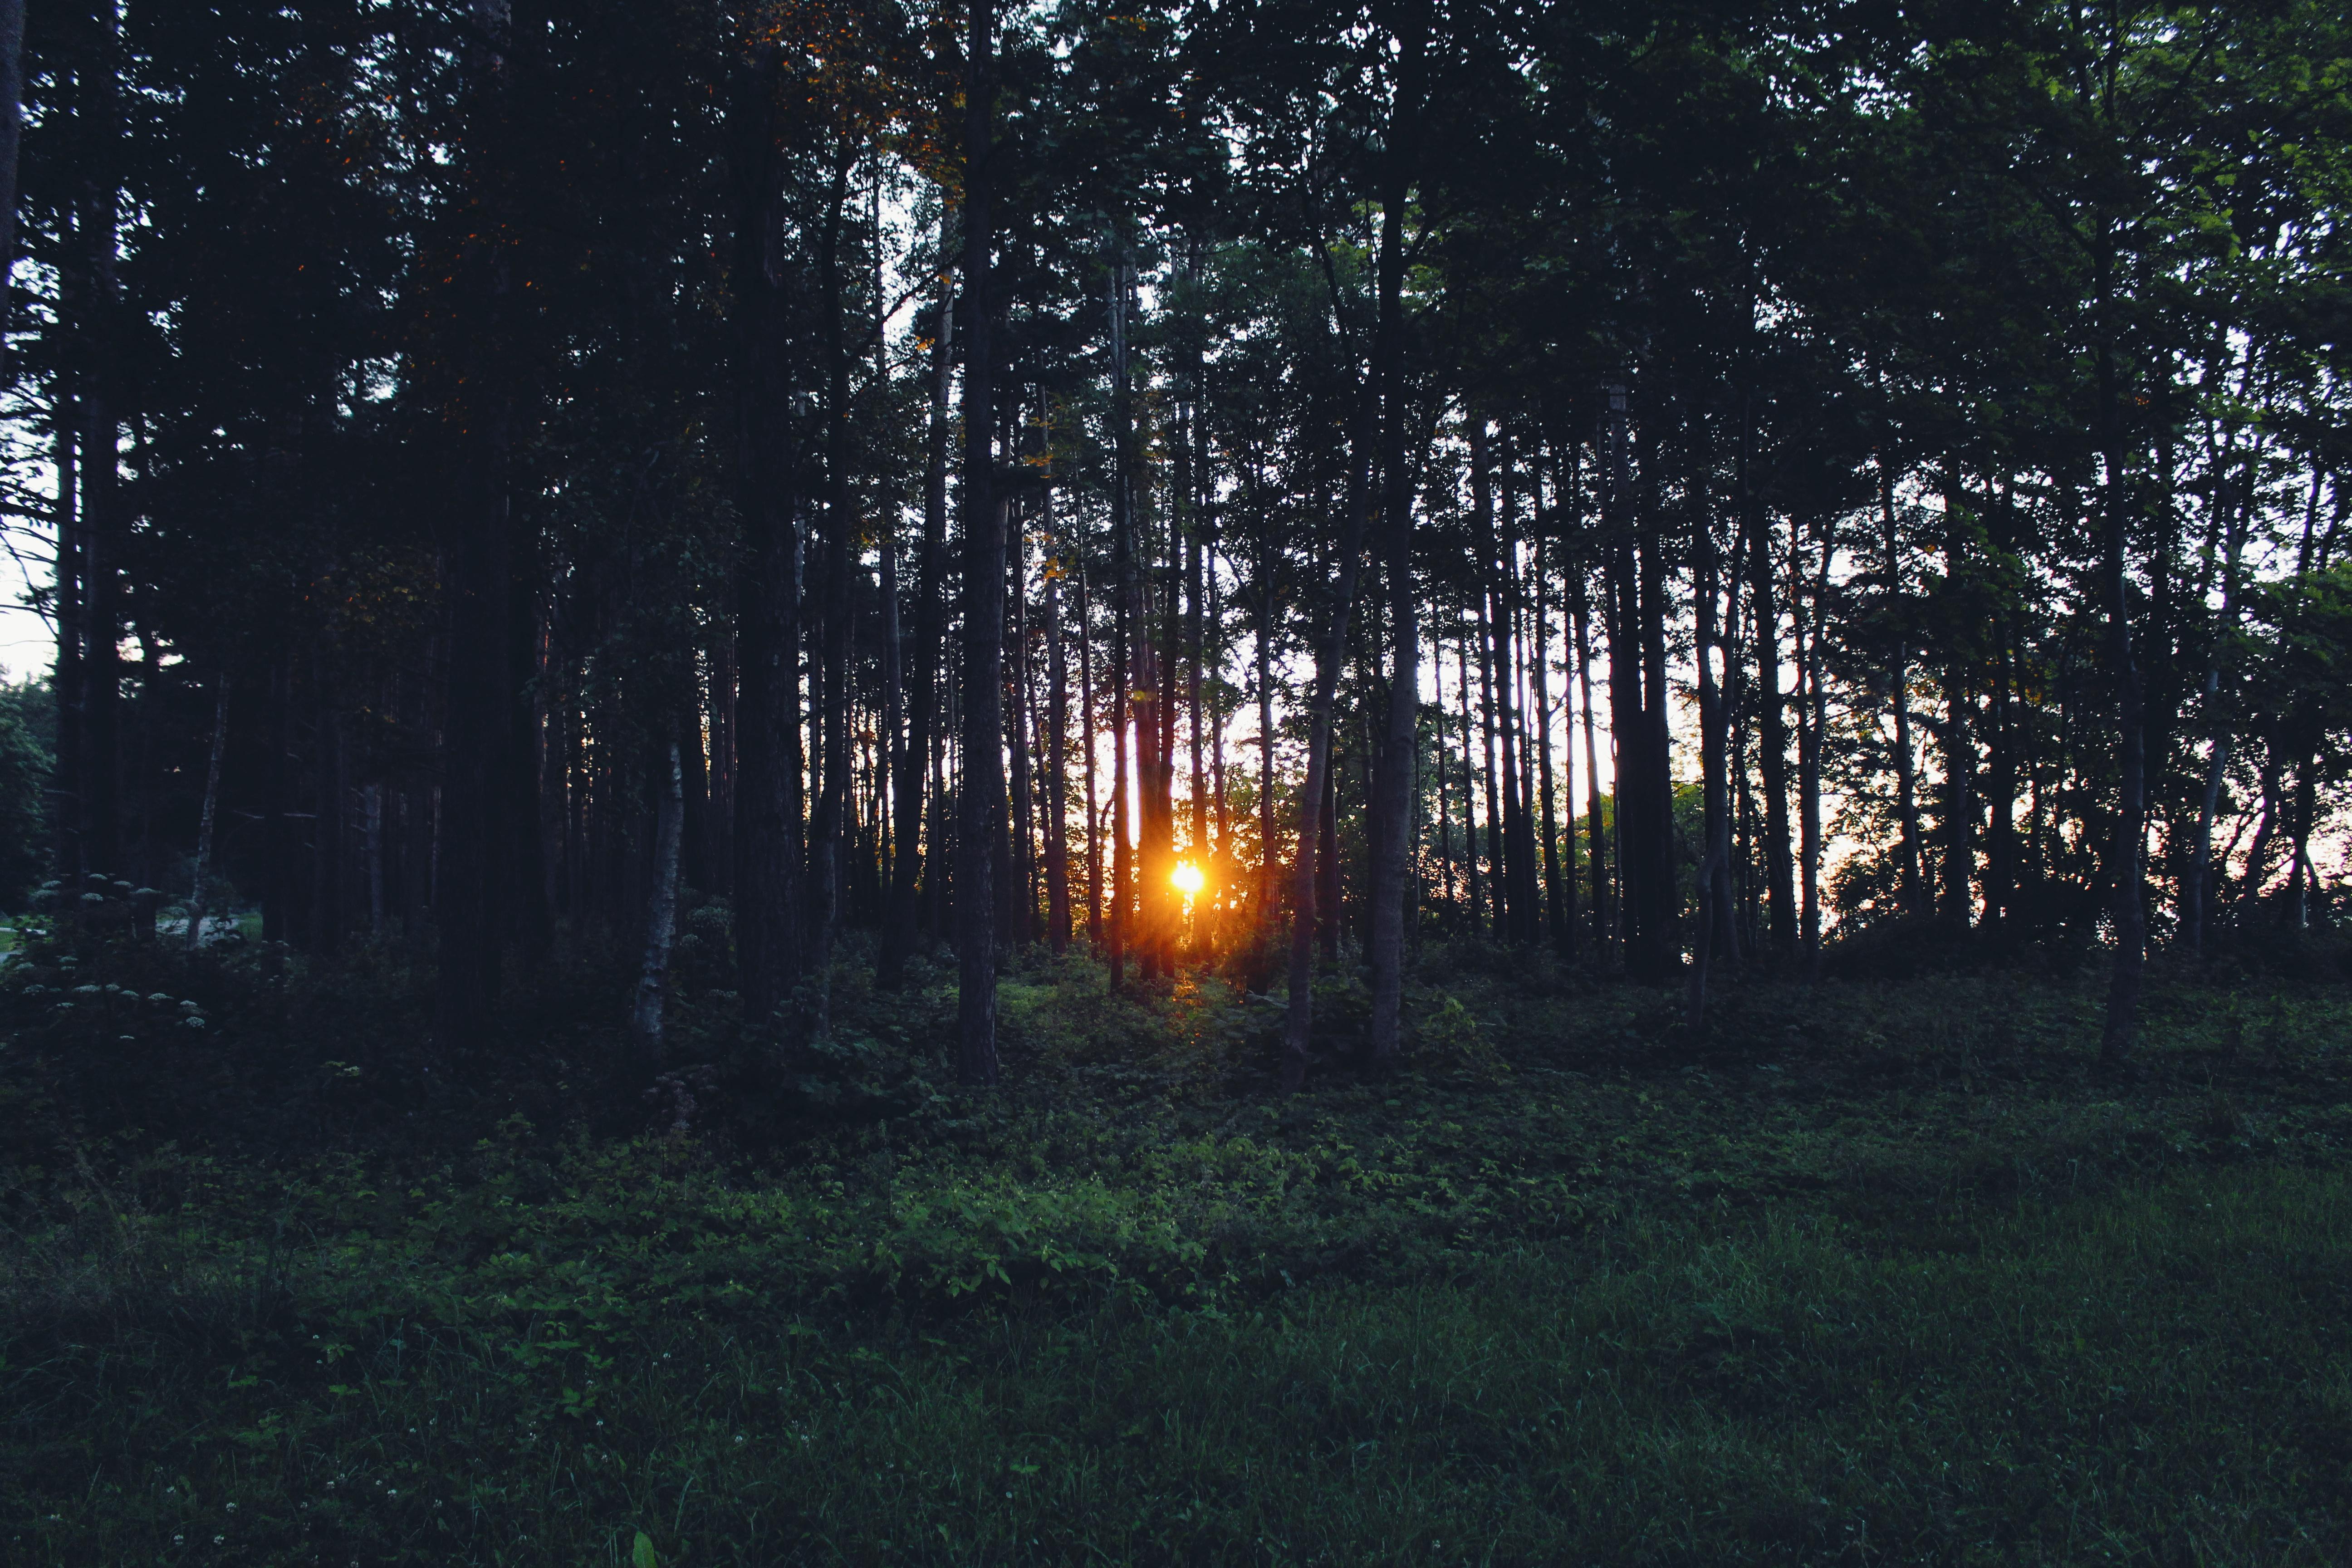 Картинки с вечерним лесом